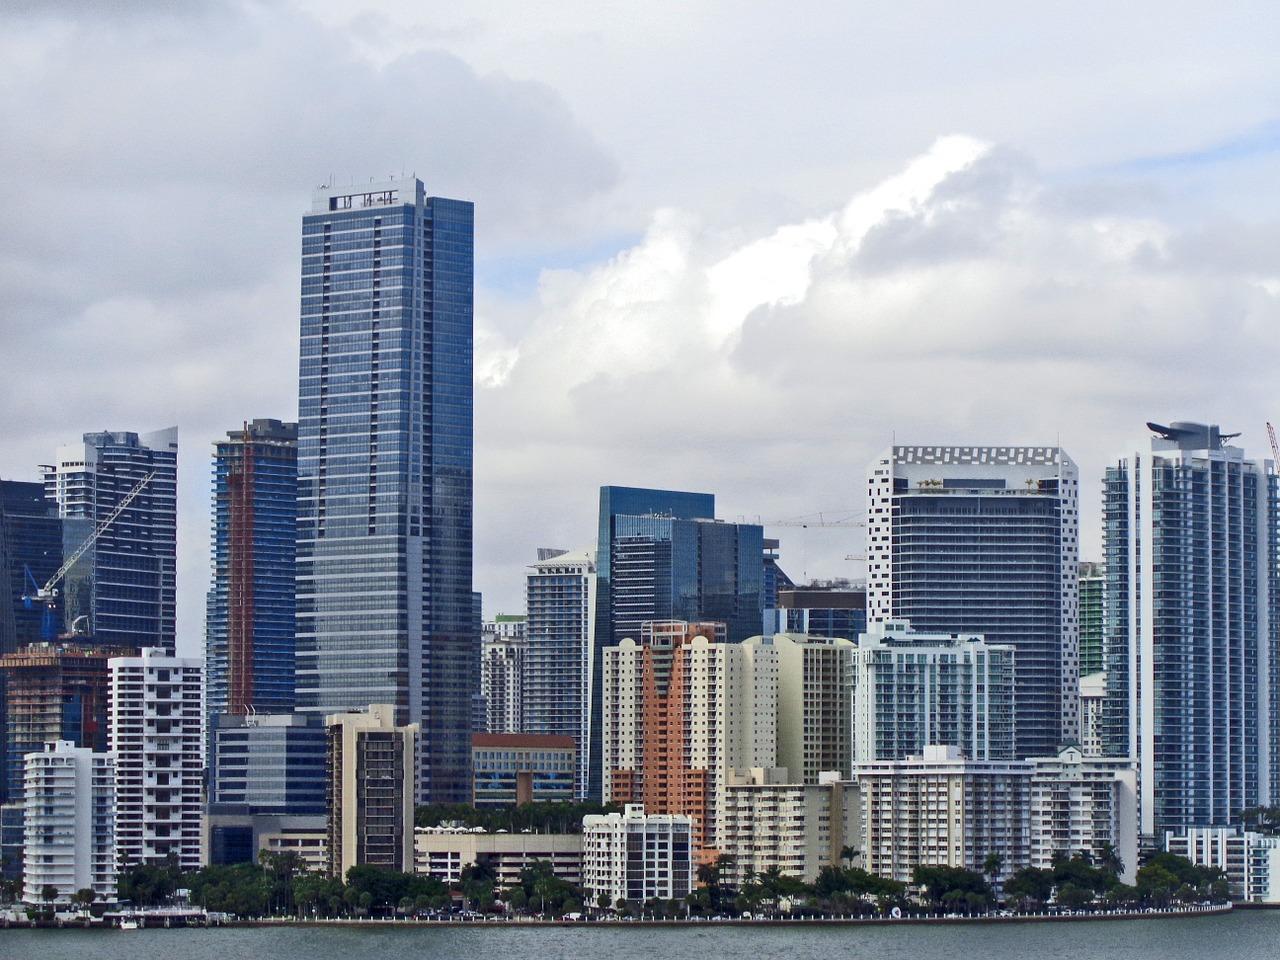 Global-Product-Sourcing-Tampa-Florida